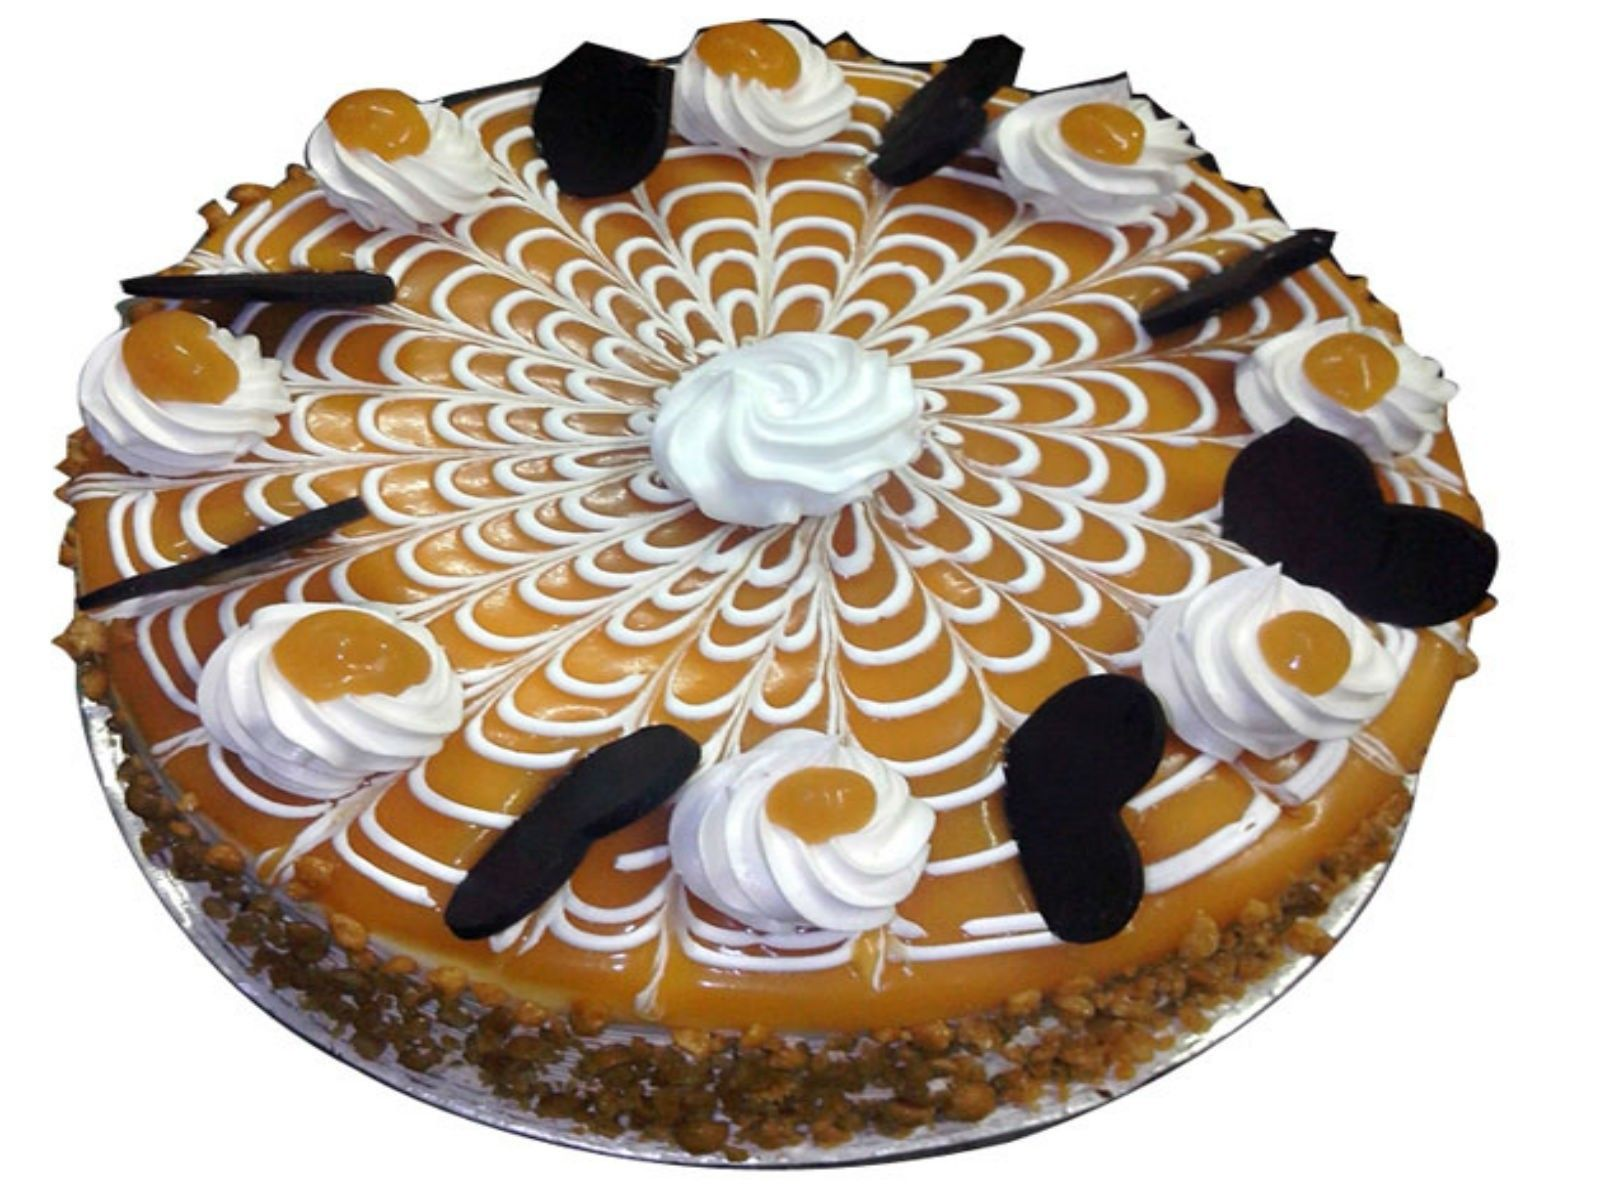 Half Kg Crunchy Butterscotch Cake Butterscotch cake